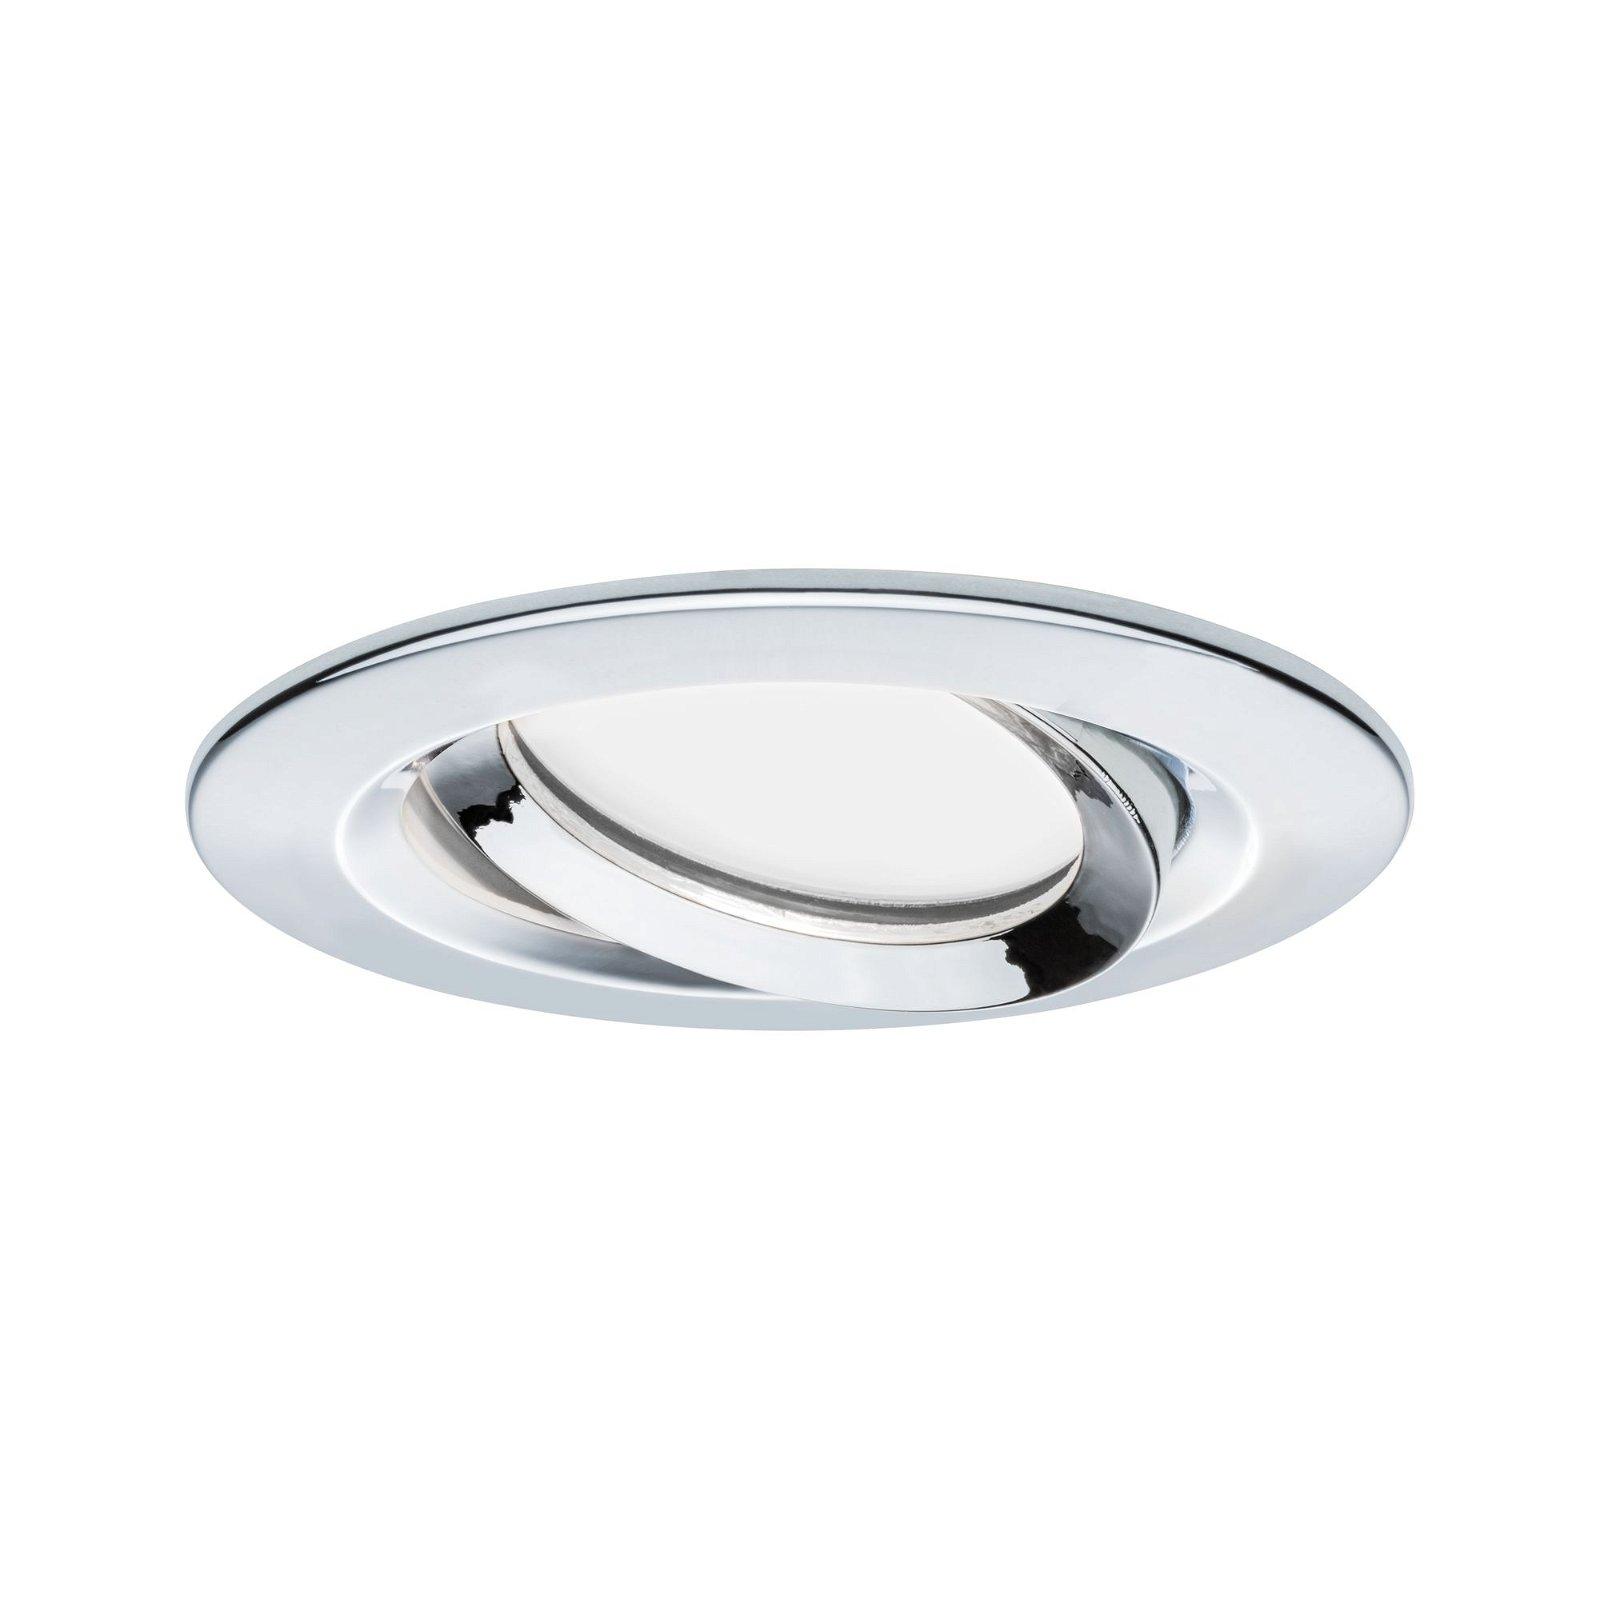 LED Recessed luminaire Nova Plus Swivelling IP65 round 93mm 30° Coin 6,8W 425lm 230V 2700K Chrome